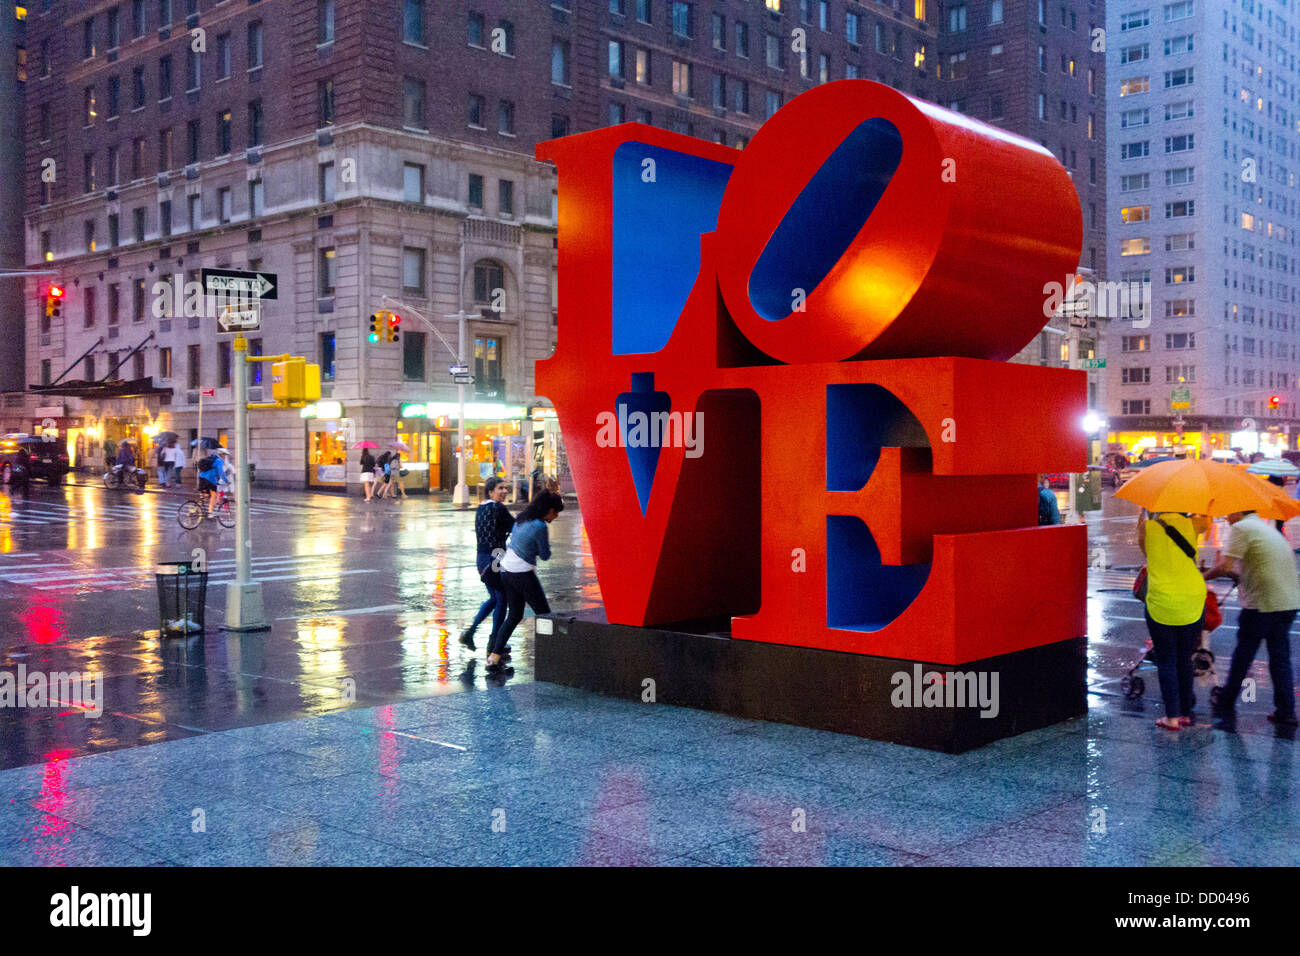 Amore scultura da Robert Indiana in NYC Immagini Stock